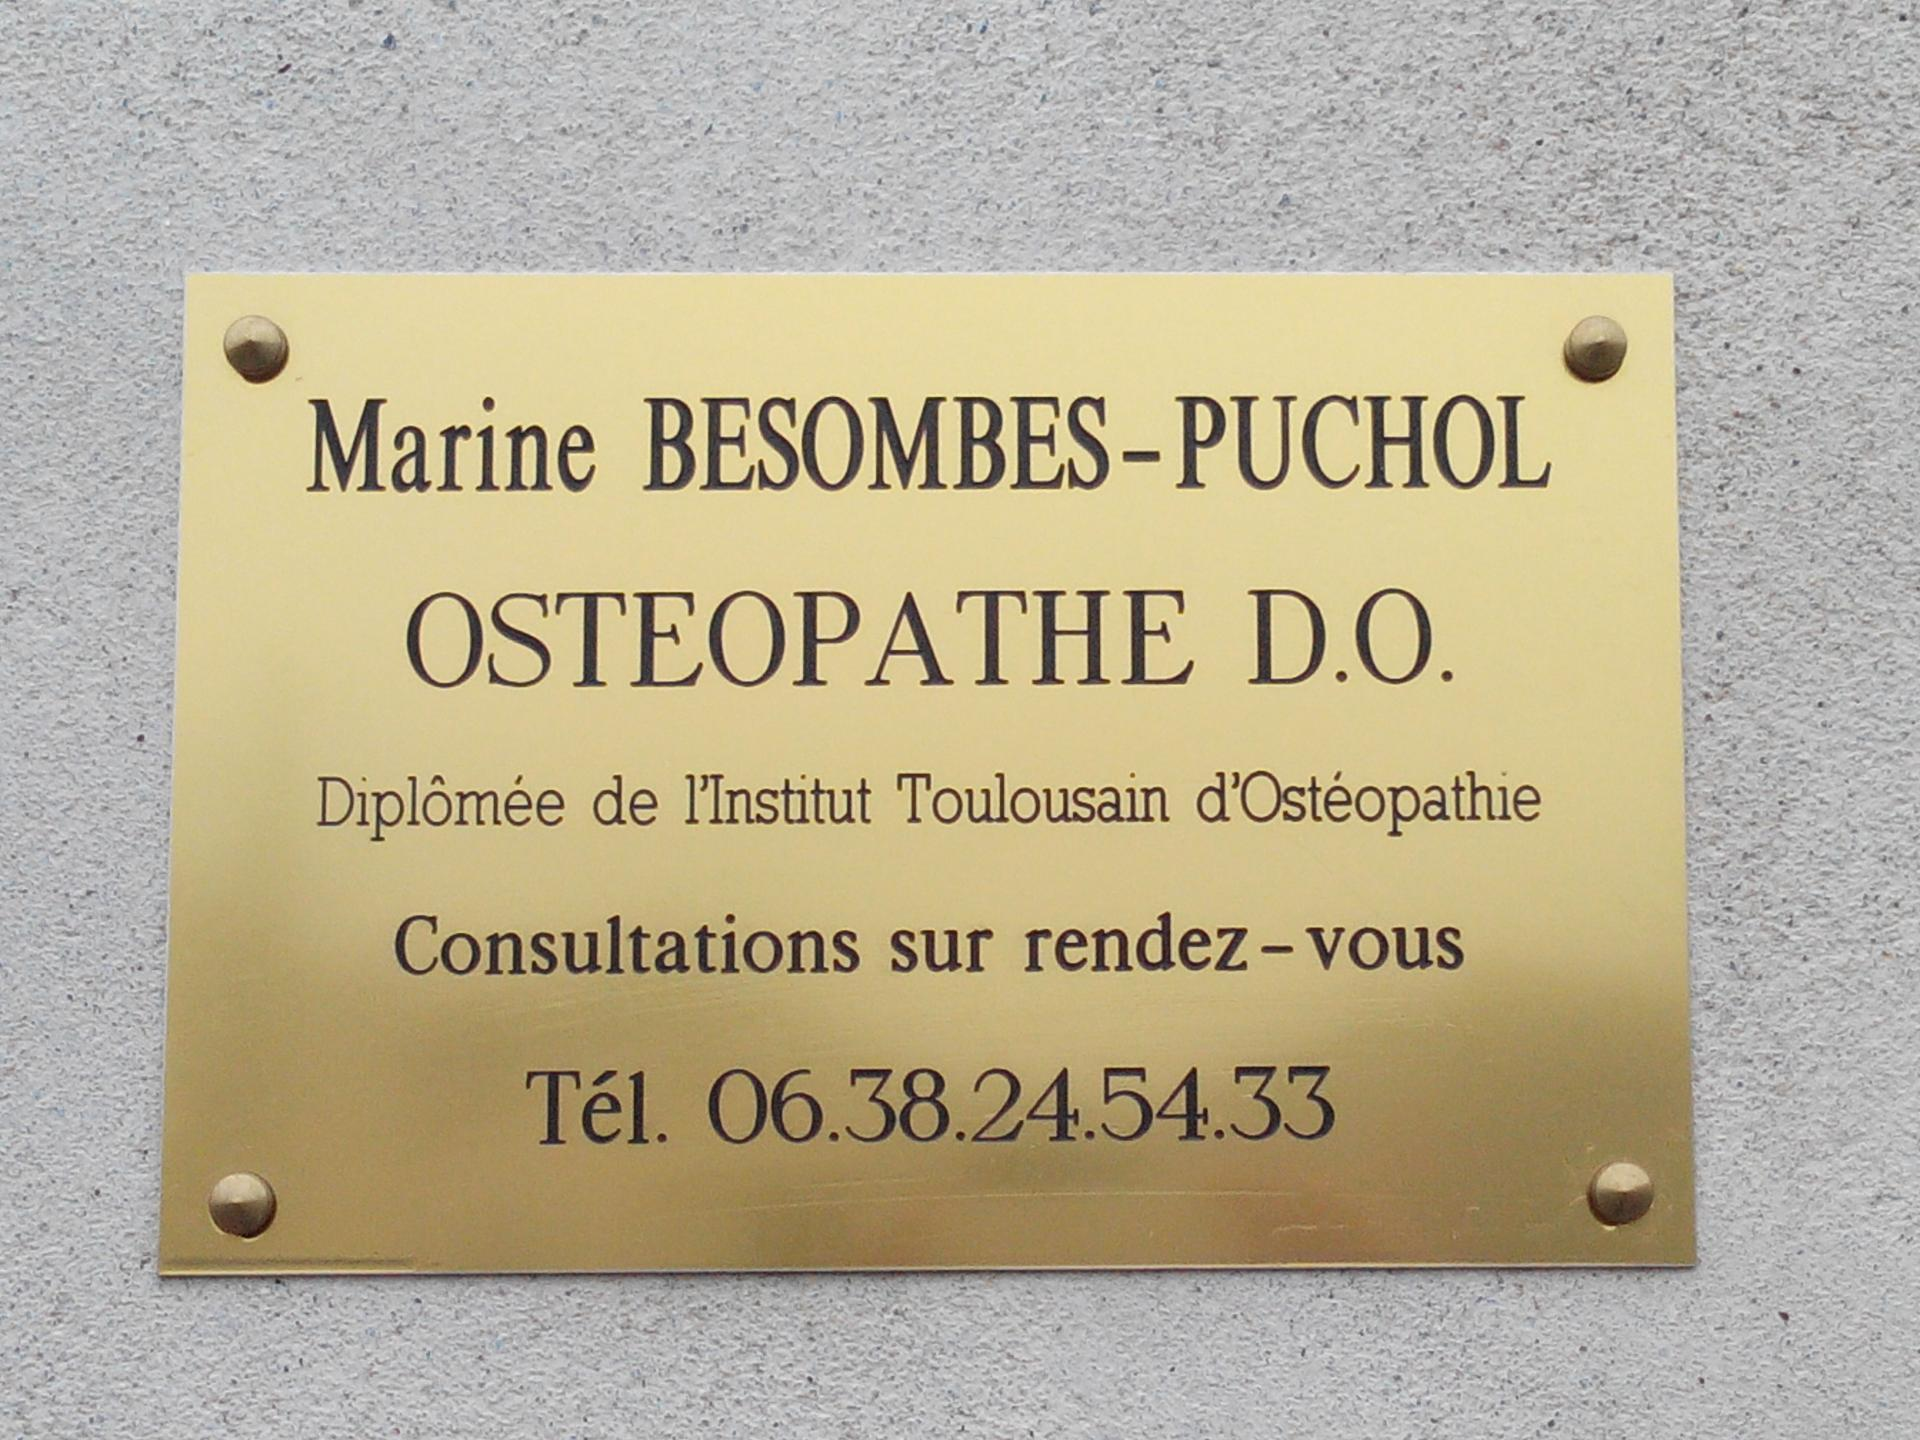 Marine Besombes-Puchol Ostéopathe